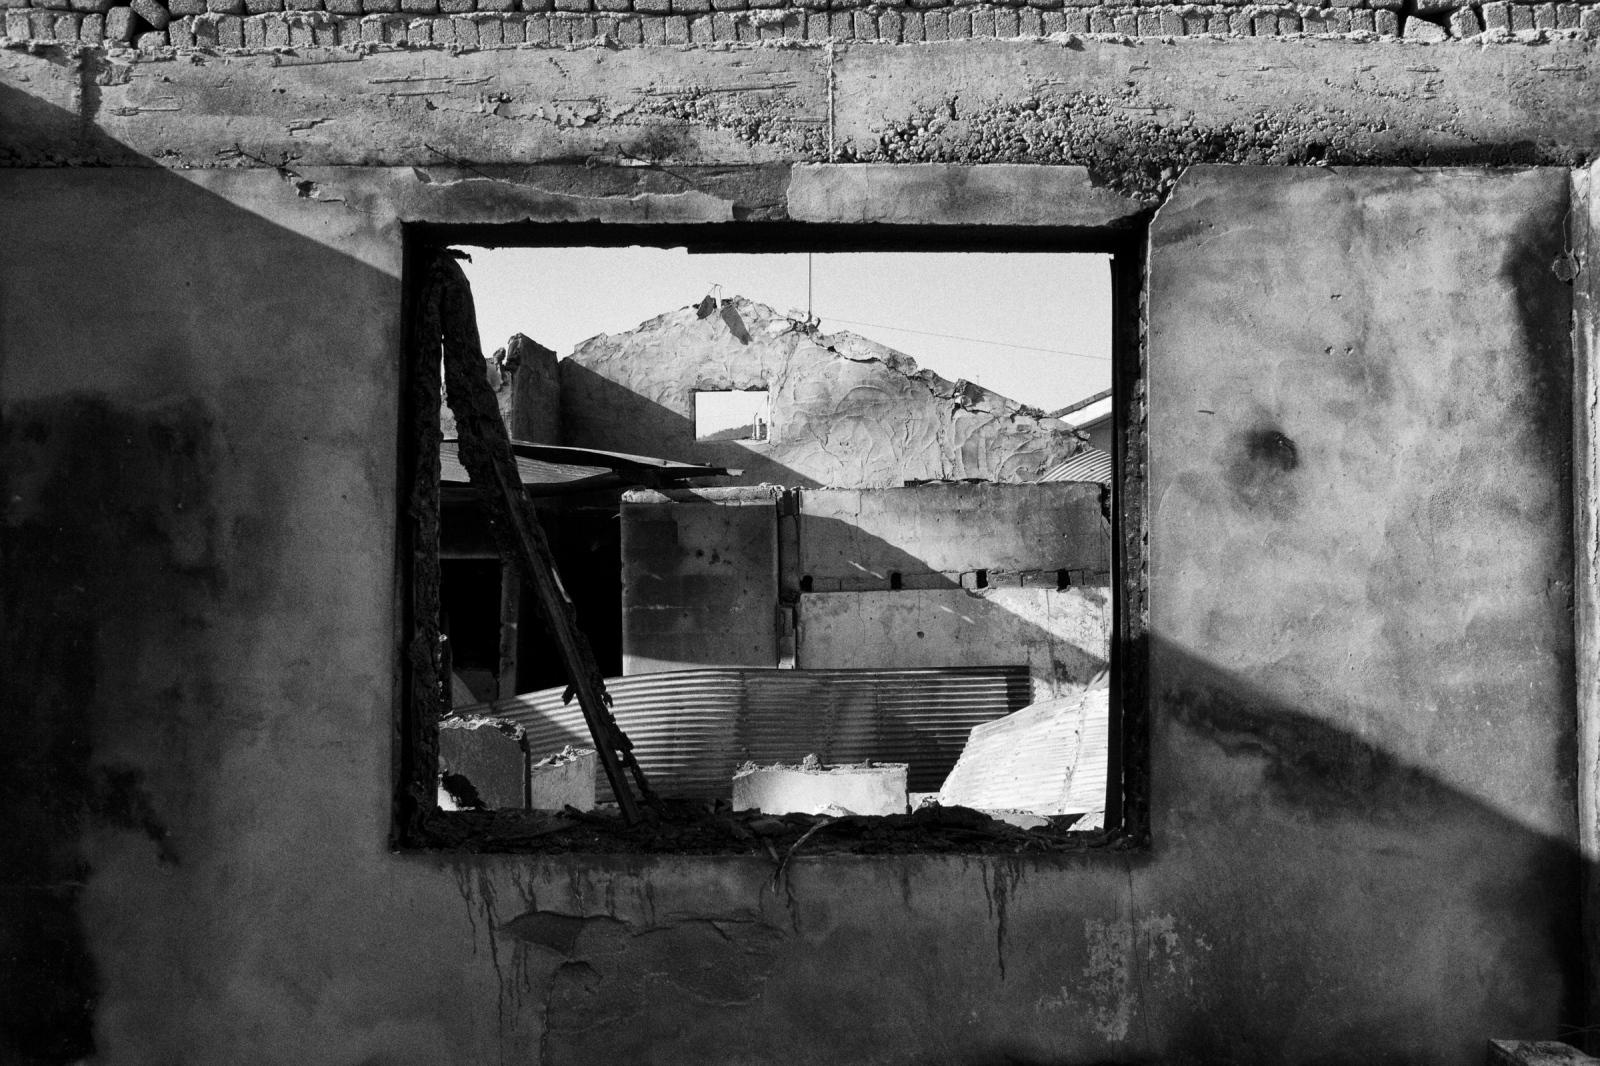 Art and Documentary Photography - Loading YeonpyeongIsland_LoRes_02.jpg